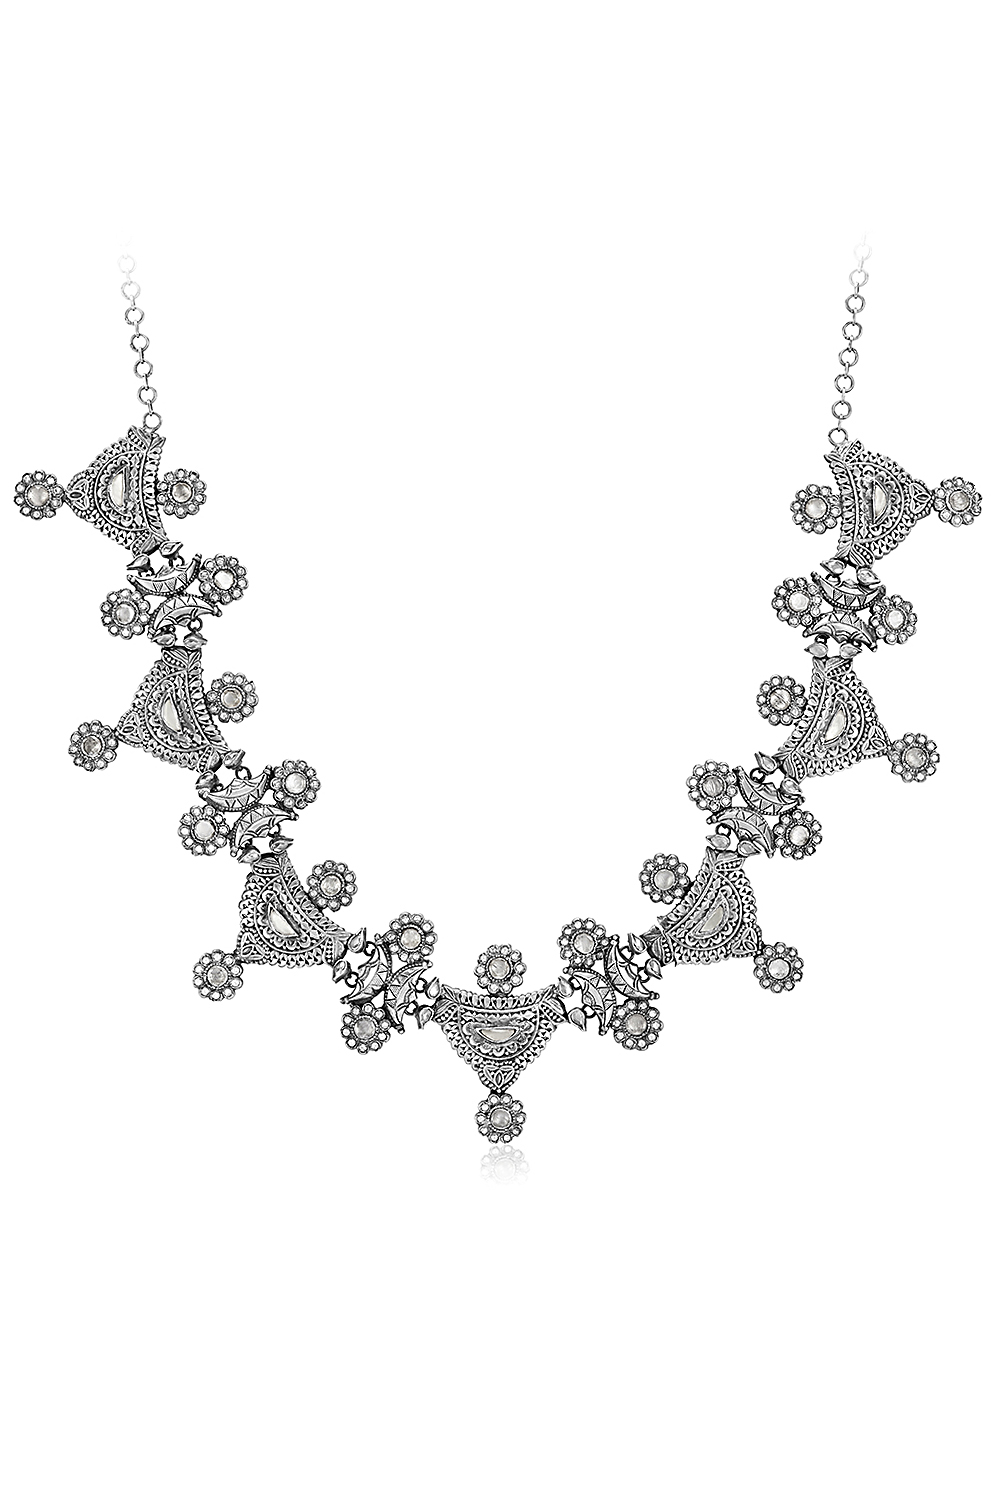 Silver Floral Glass Multimotif Choker